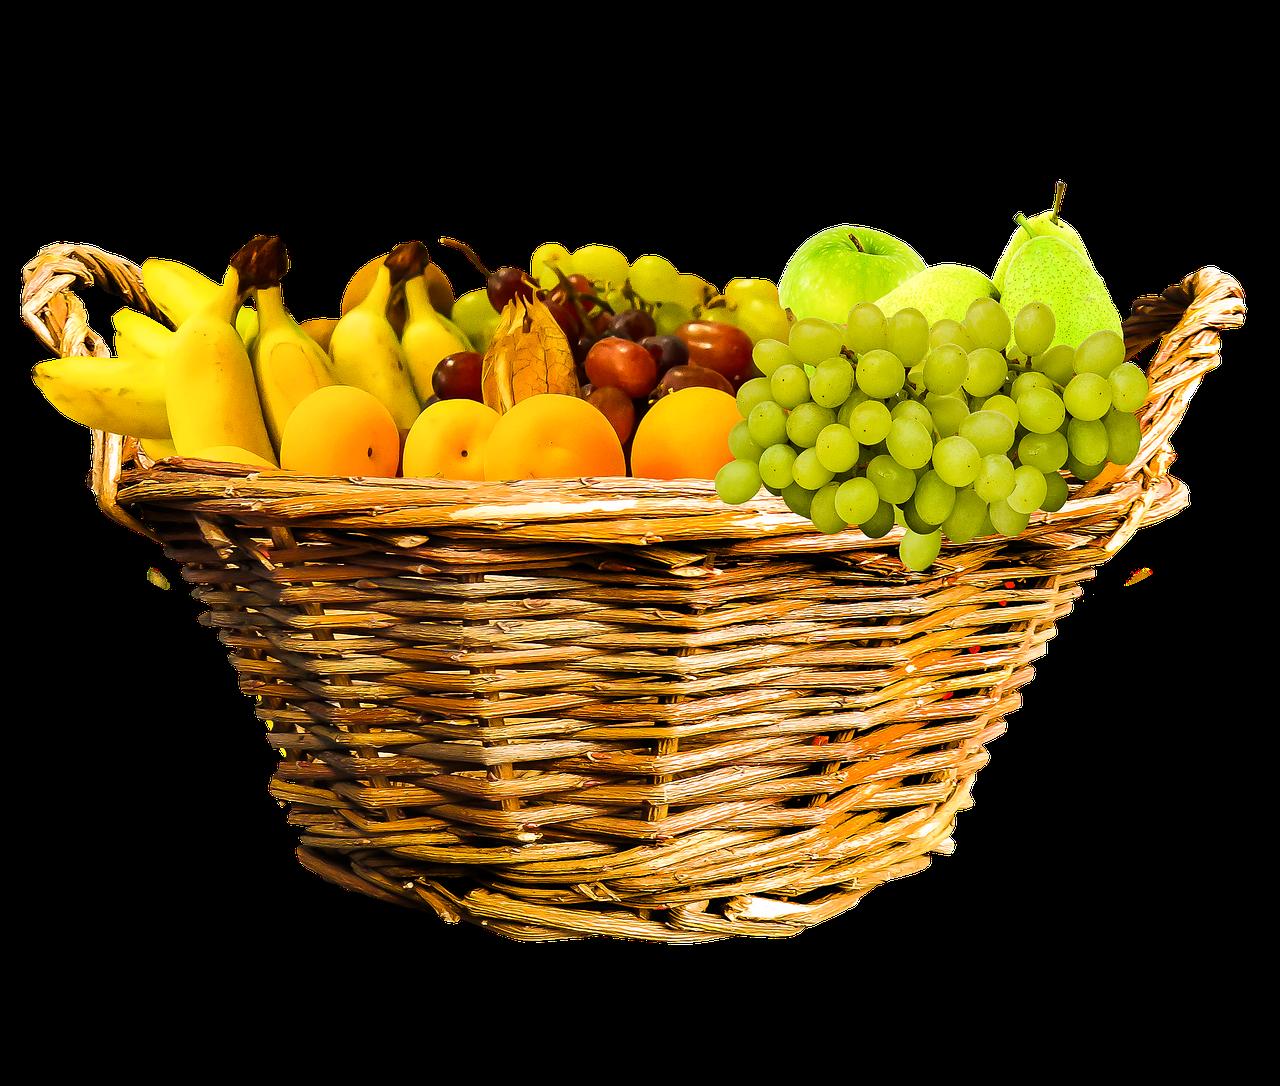 Terveelliset hedelmät